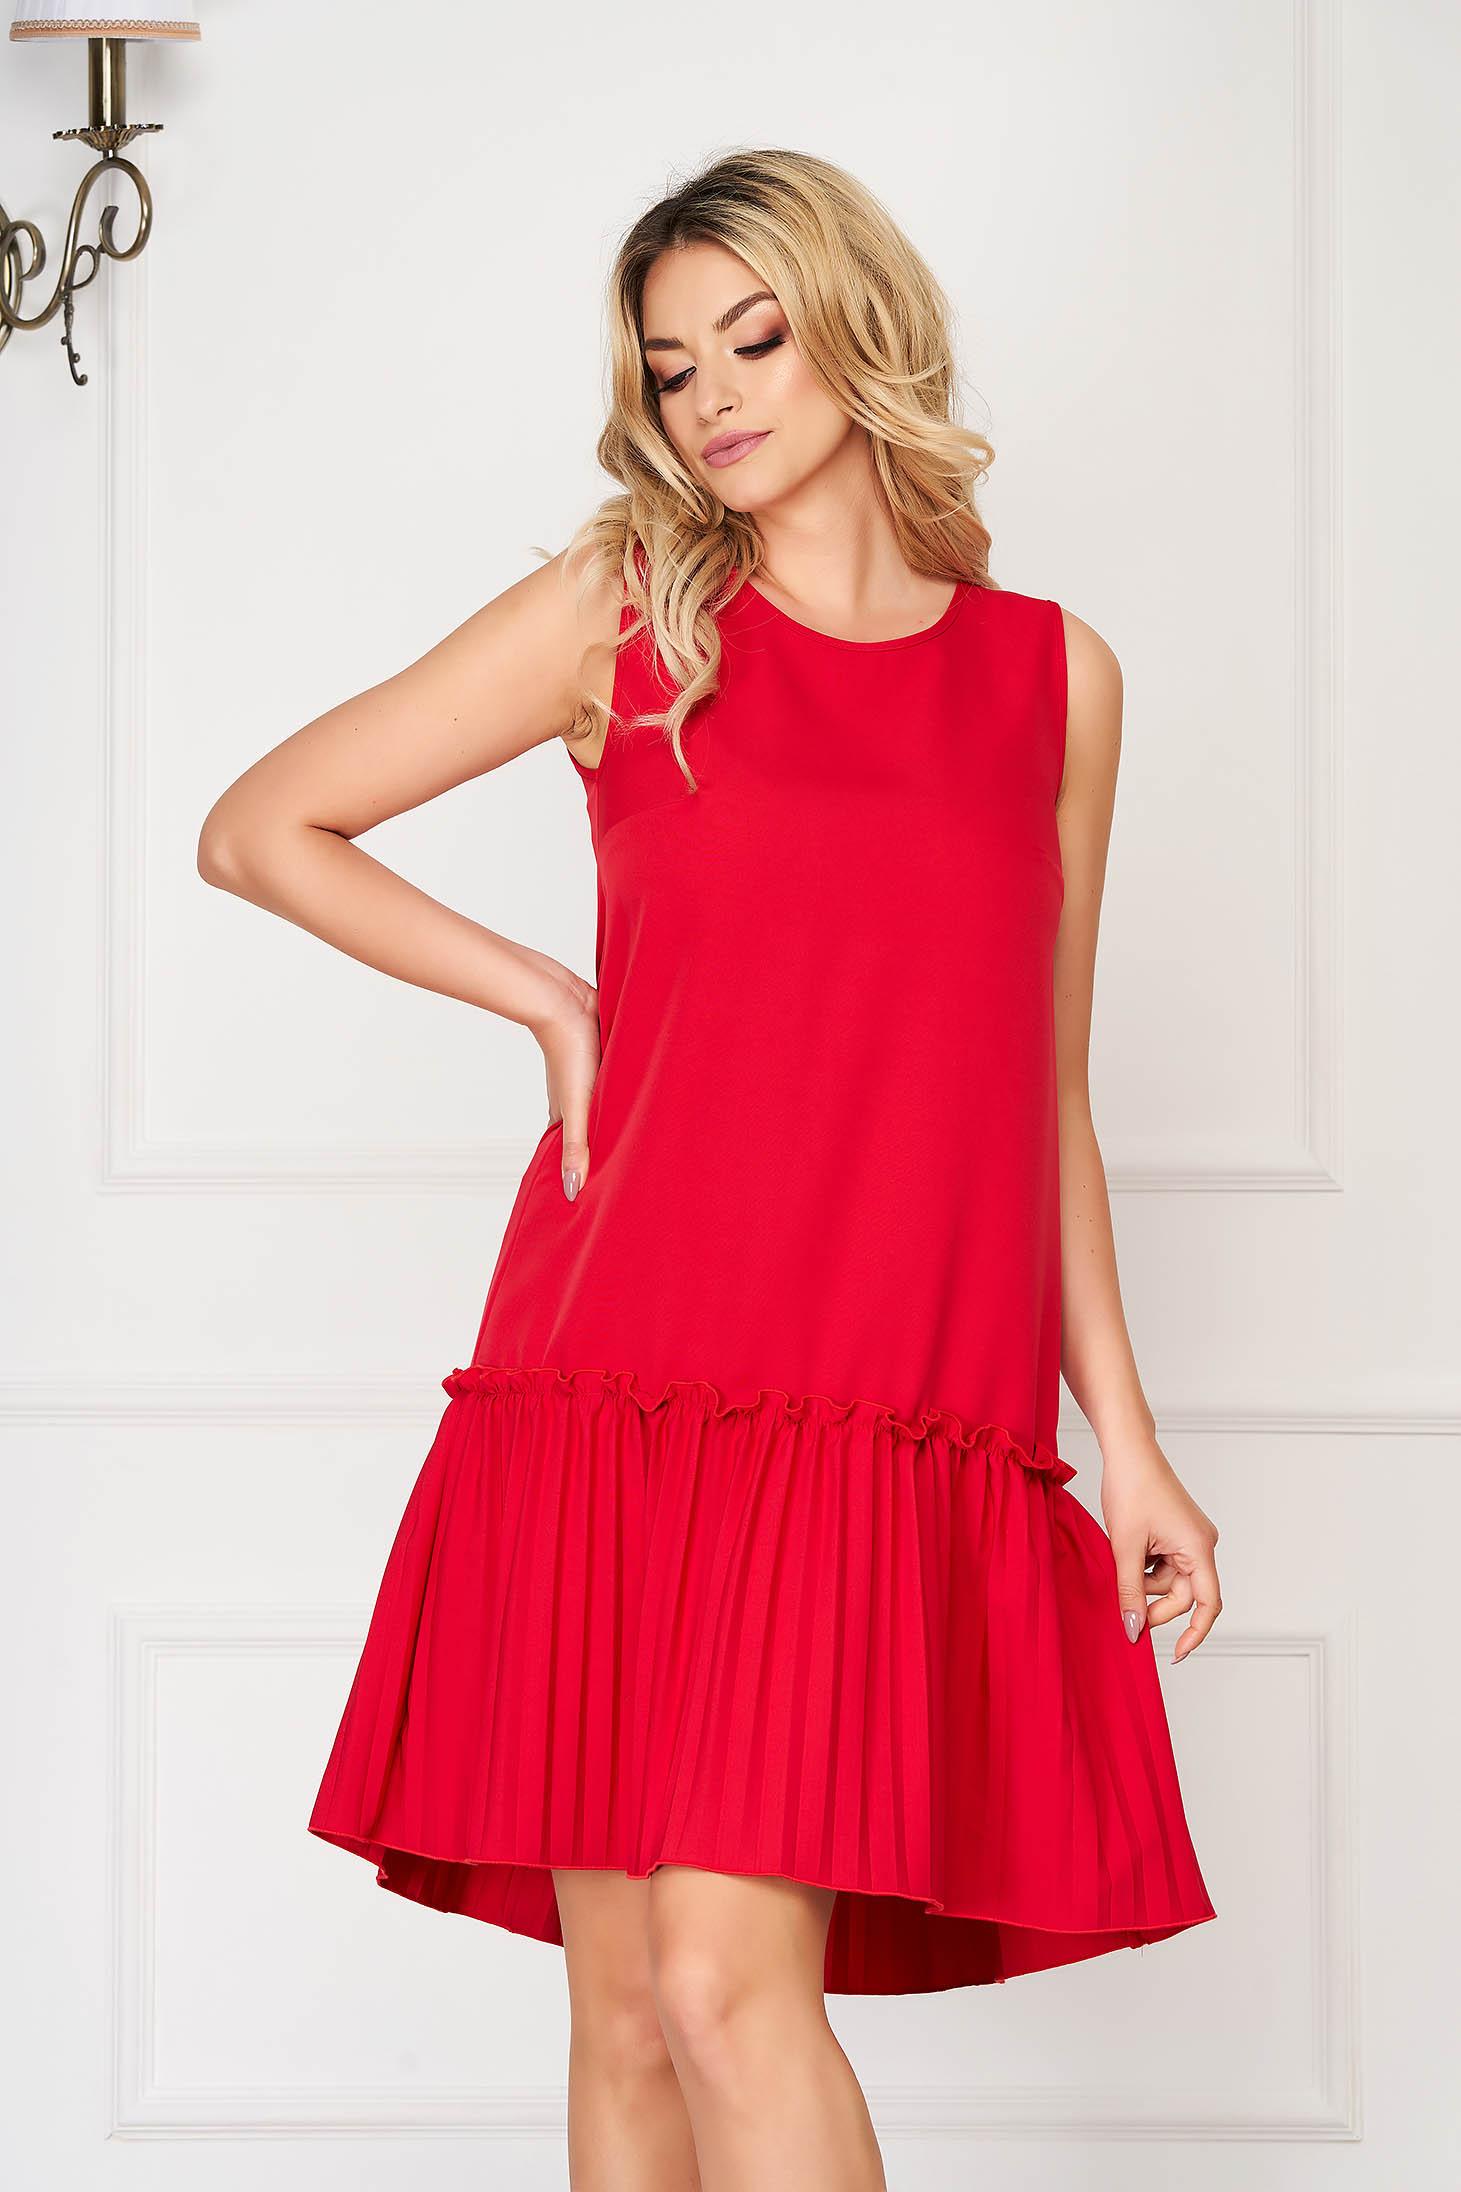 Rochie StarShinerS rosie scurta de zi din stofa elastica cu croi larg fara maneci